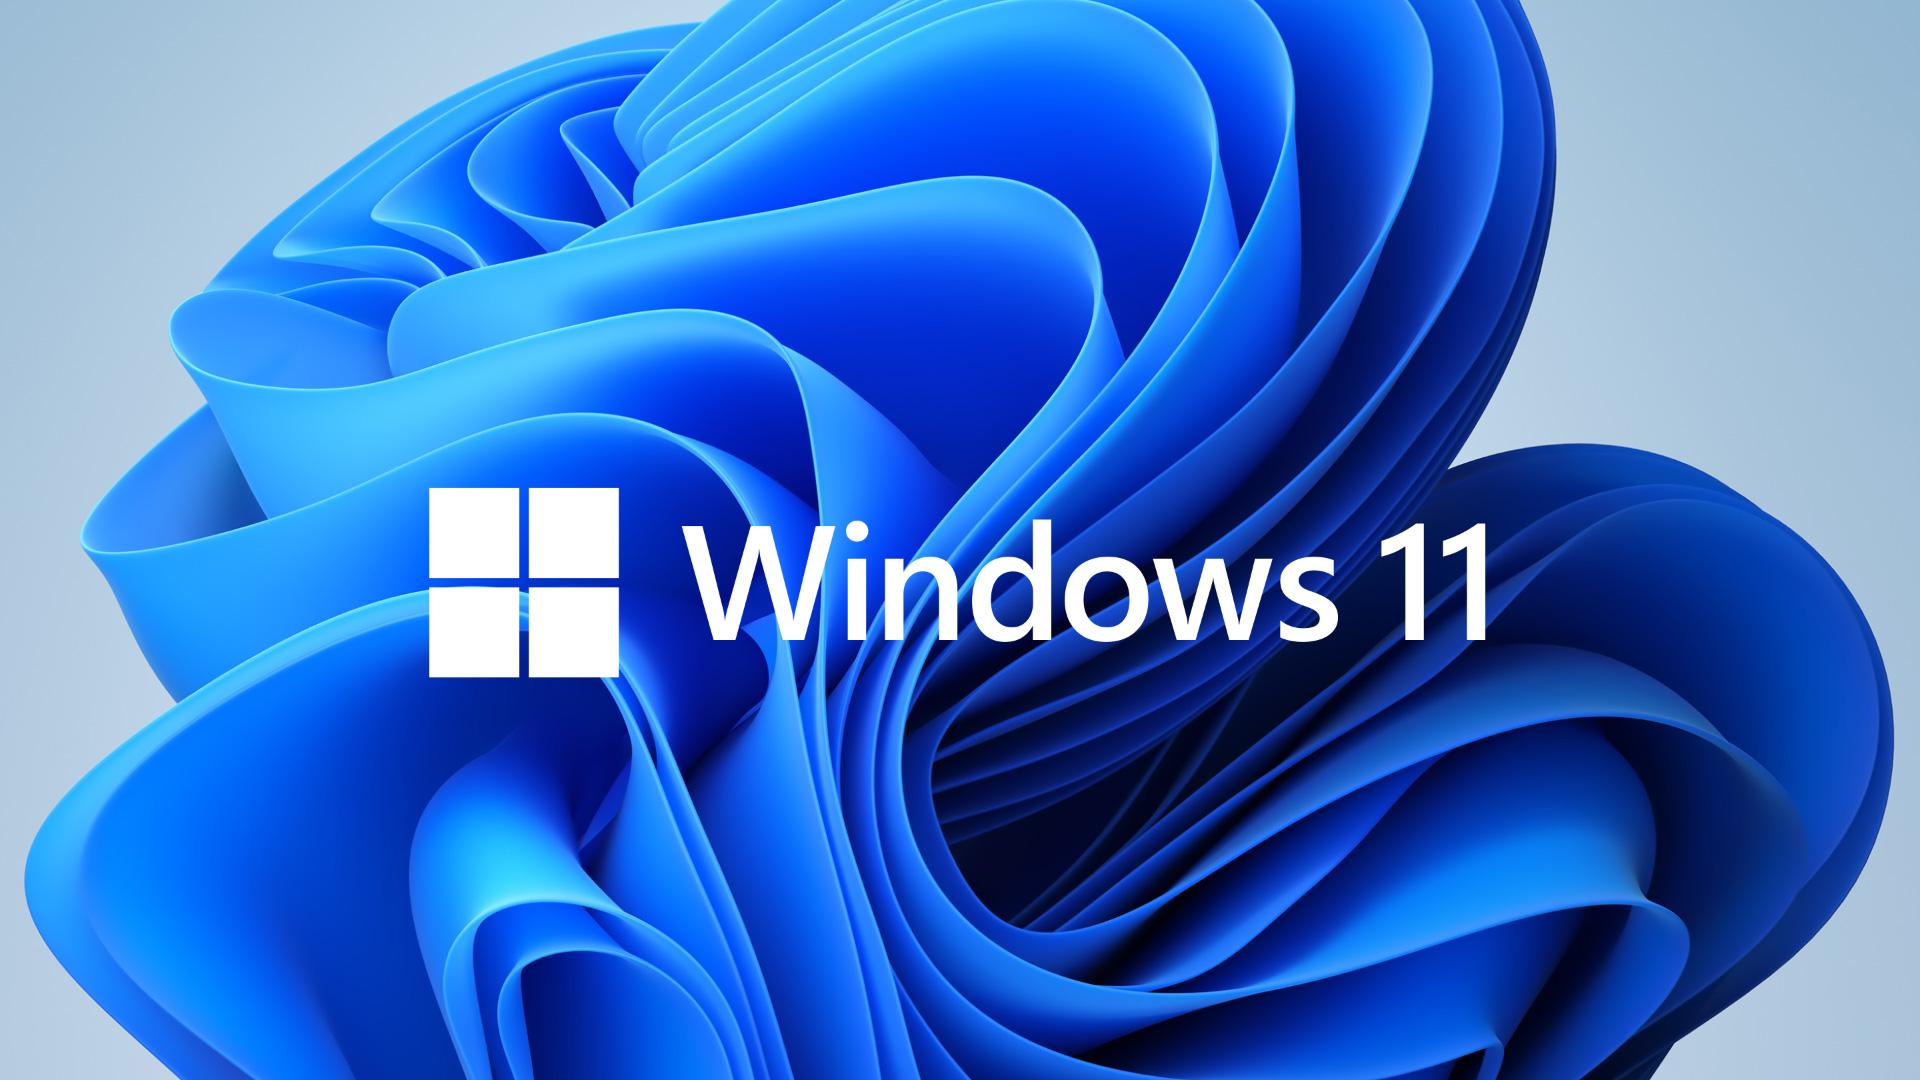 Windows 11 logo and decorative background